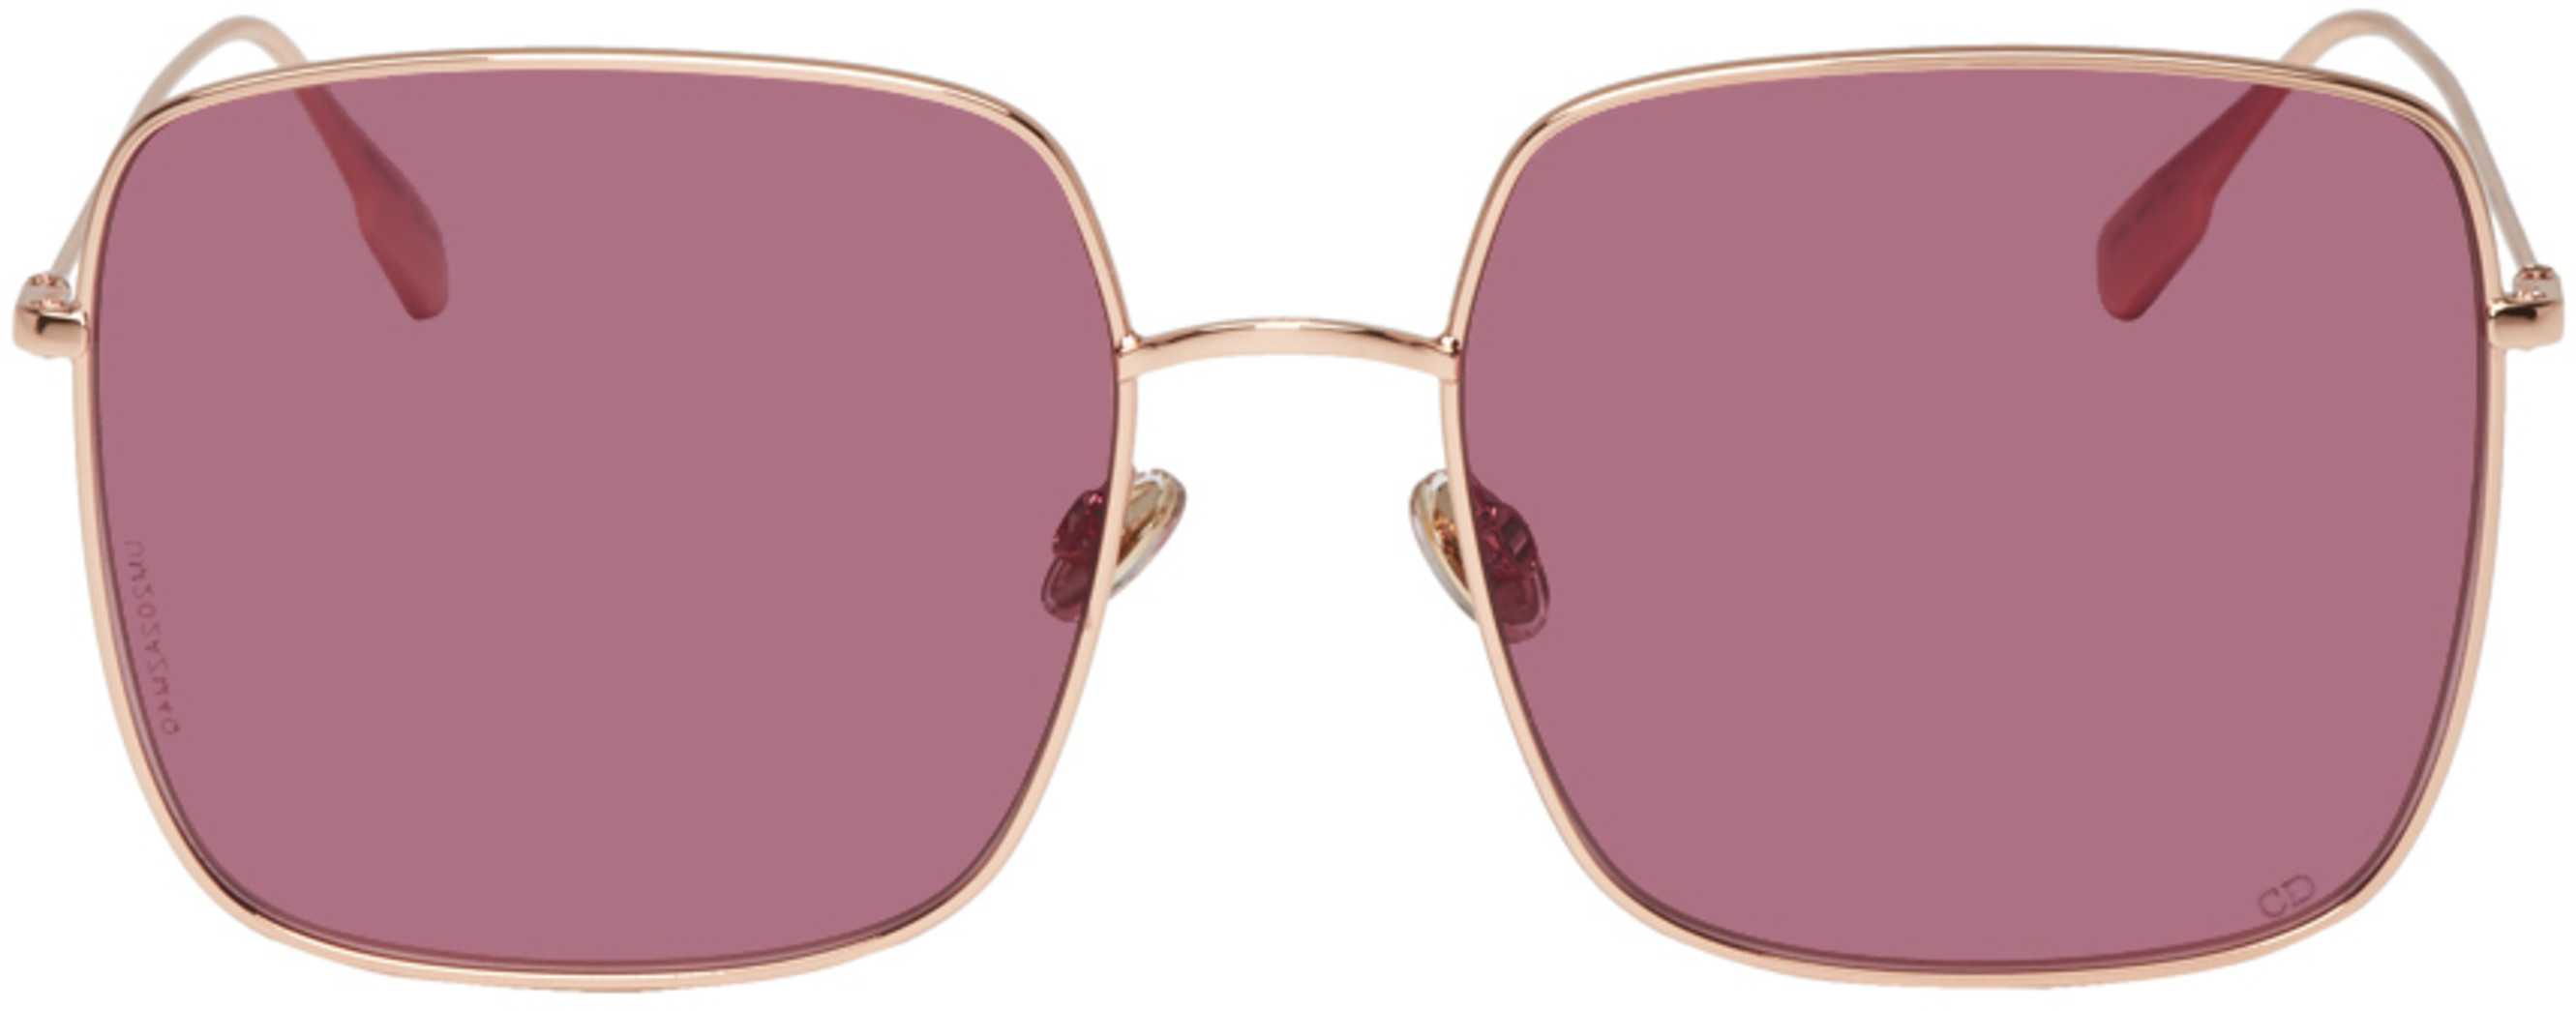 a6492514185 Designer sunglasses for Women